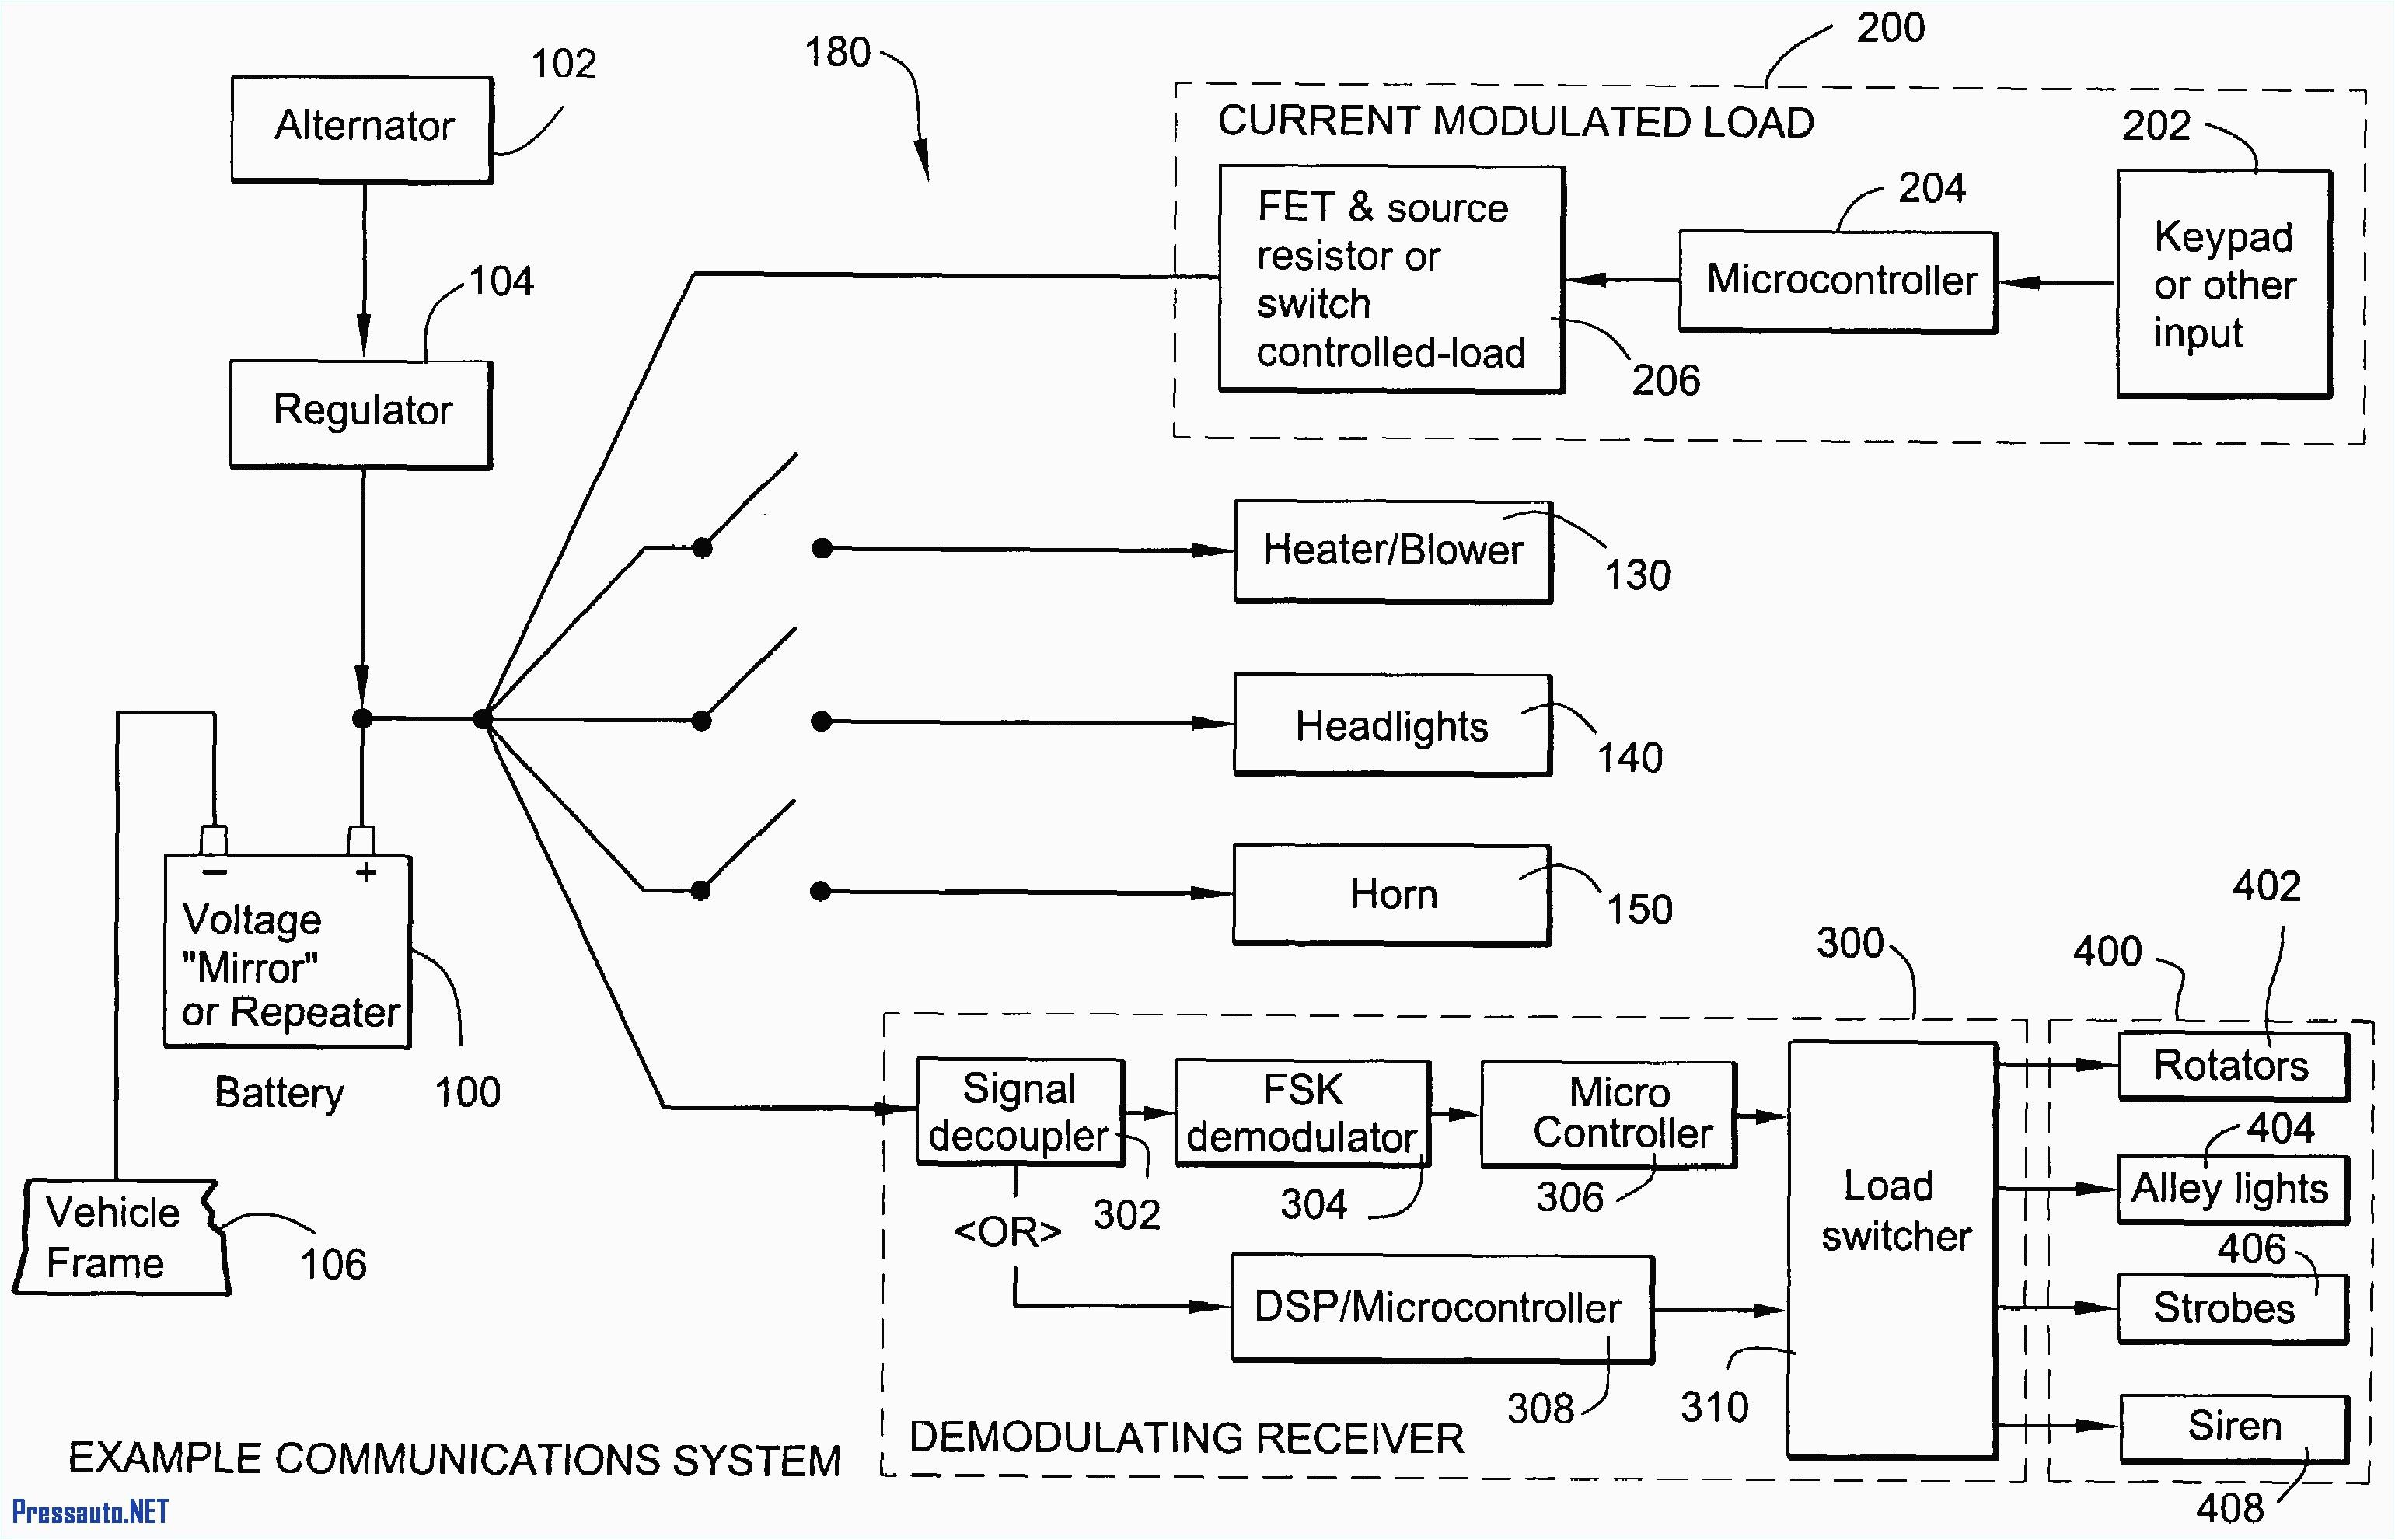 wiring diagram whelen ulf44 wiring diagram page mix wiring diagram whelen ulf44 wiring diagram centre whelen